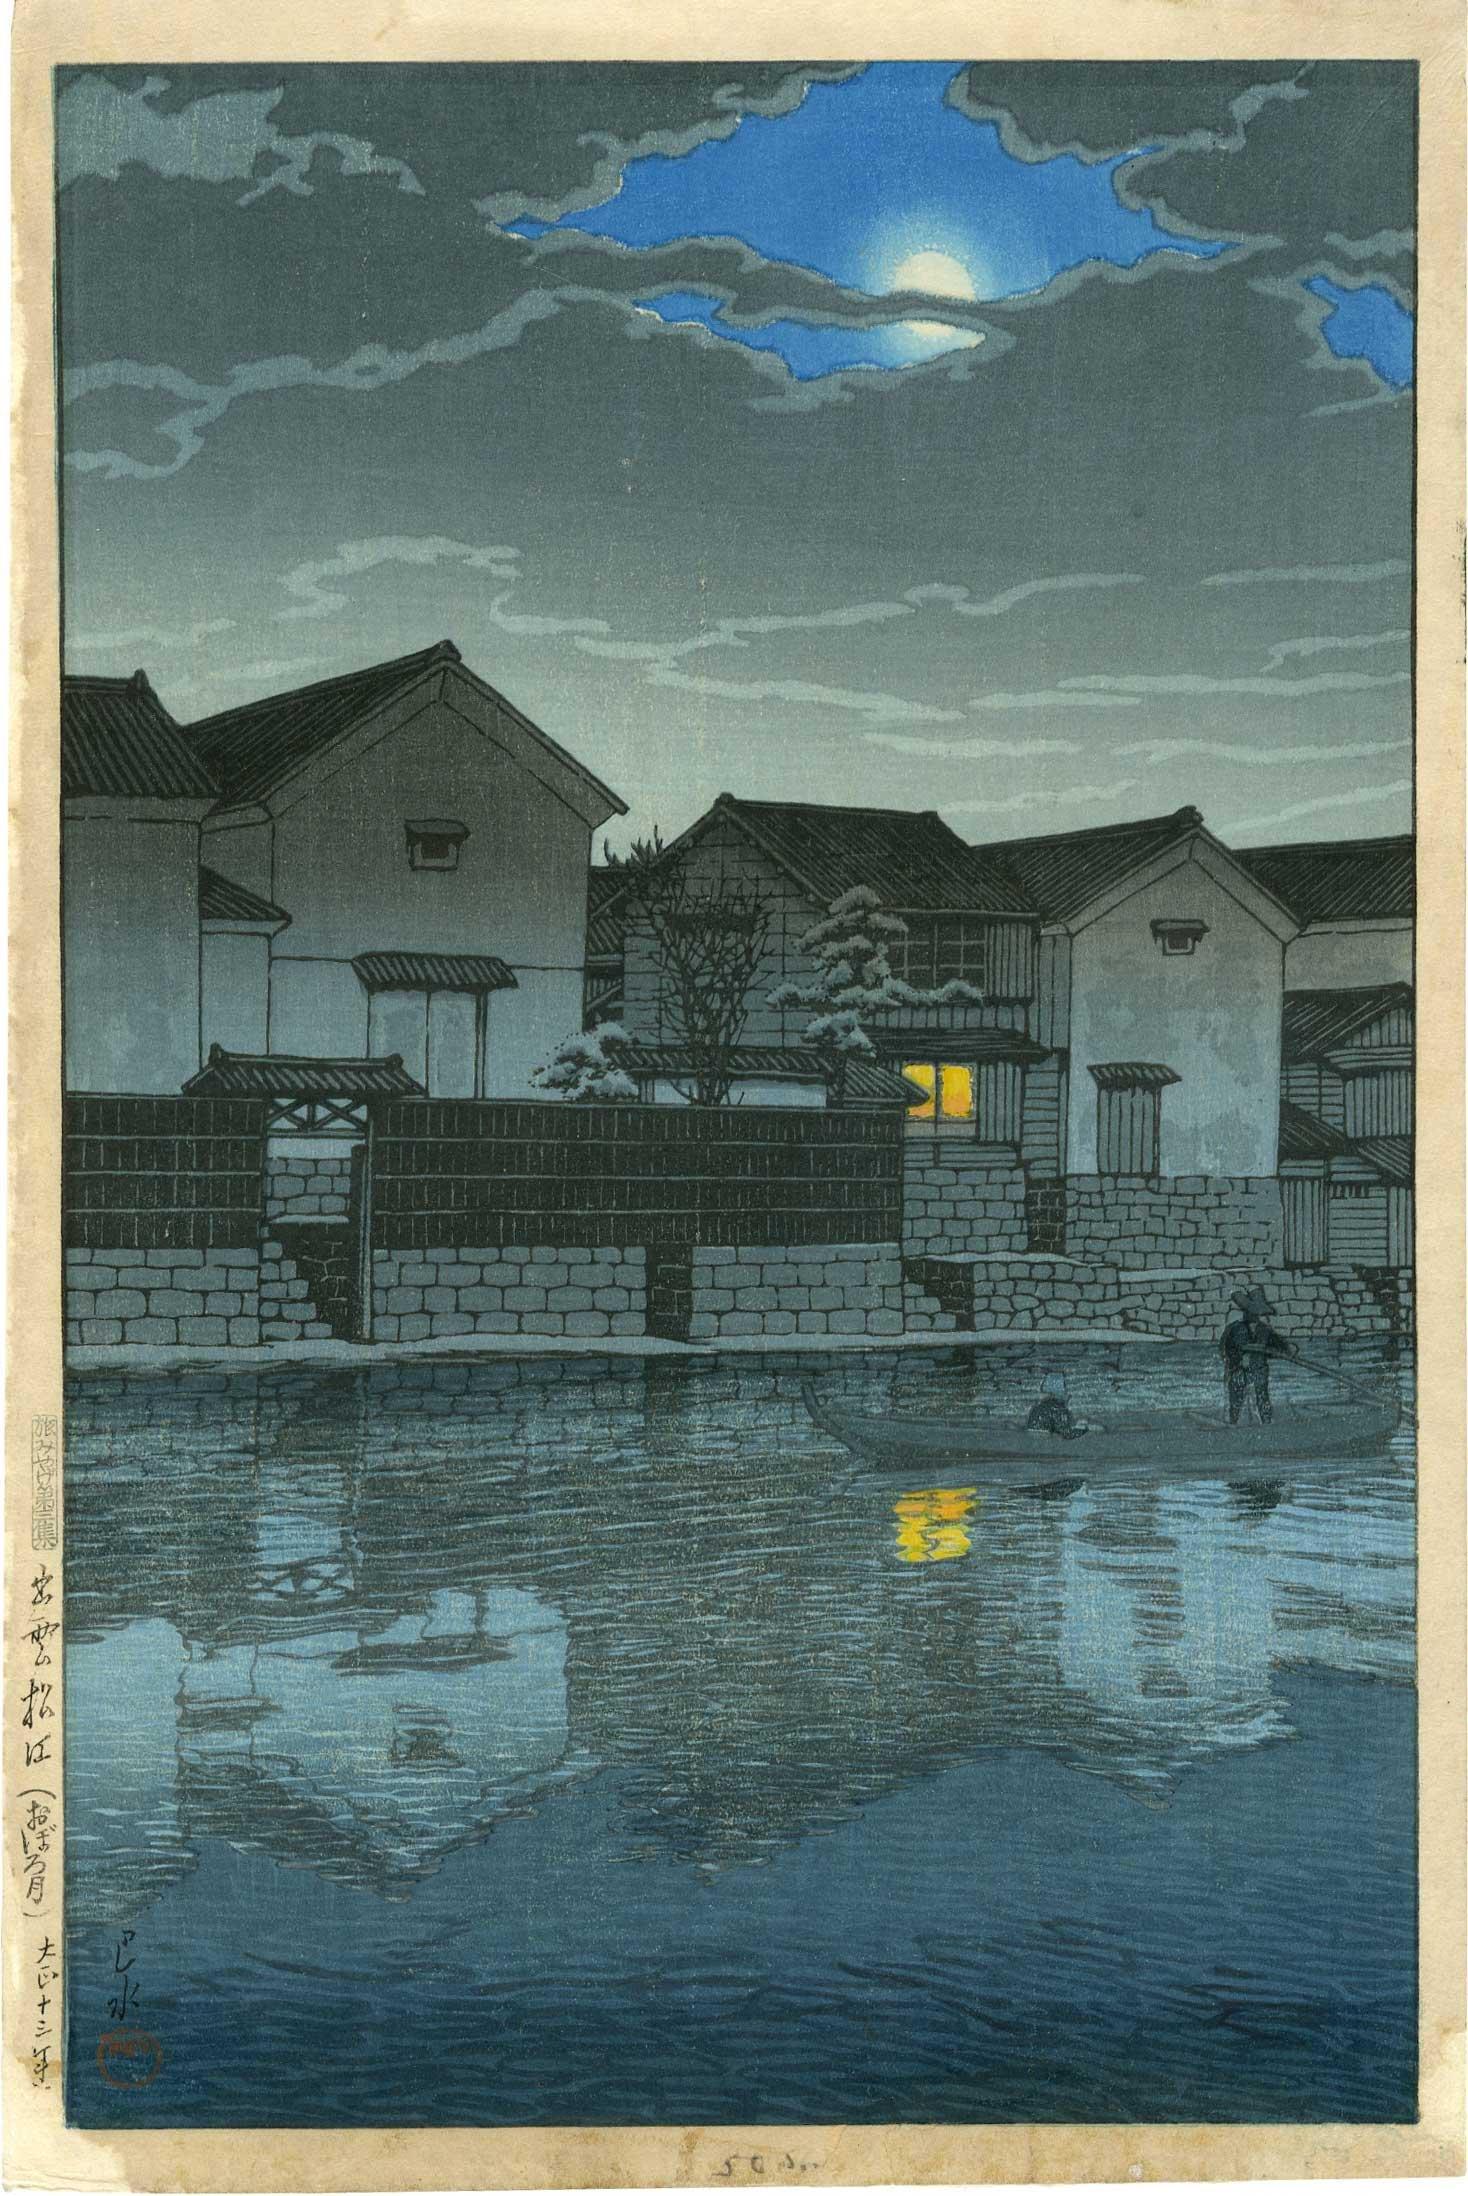 Hasui Kawase - Matsue, Izumo 1924 Woodblock